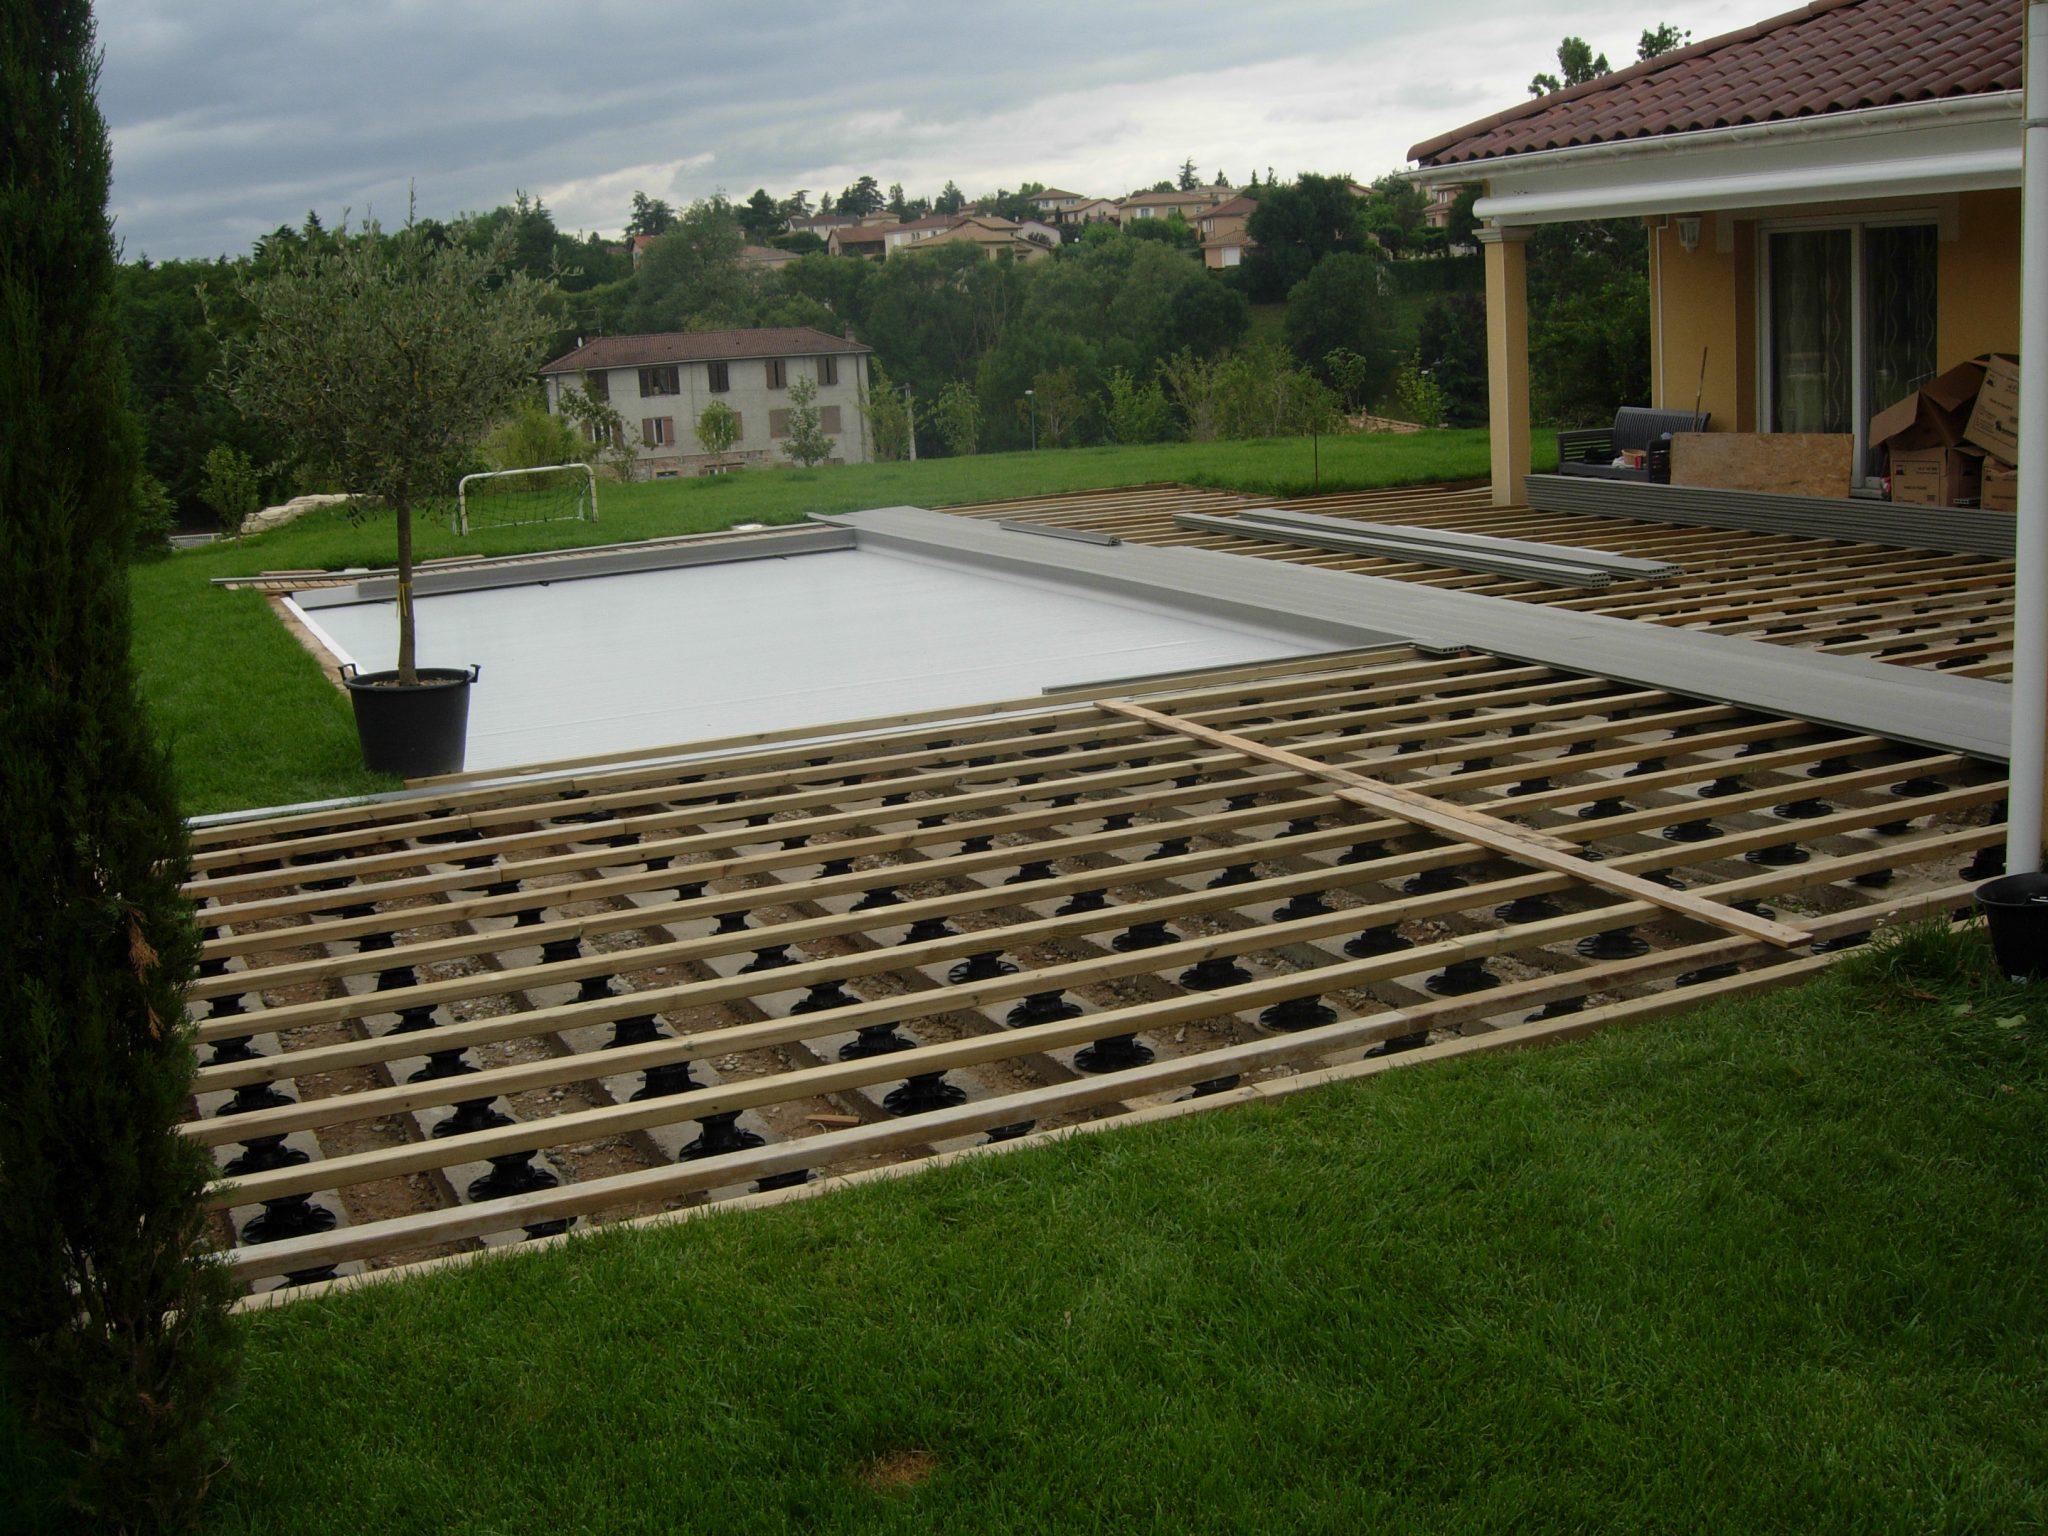 plancher de terrasse en composite l 39 habis. Black Bedroom Furniture Sets. Home Design Ideas